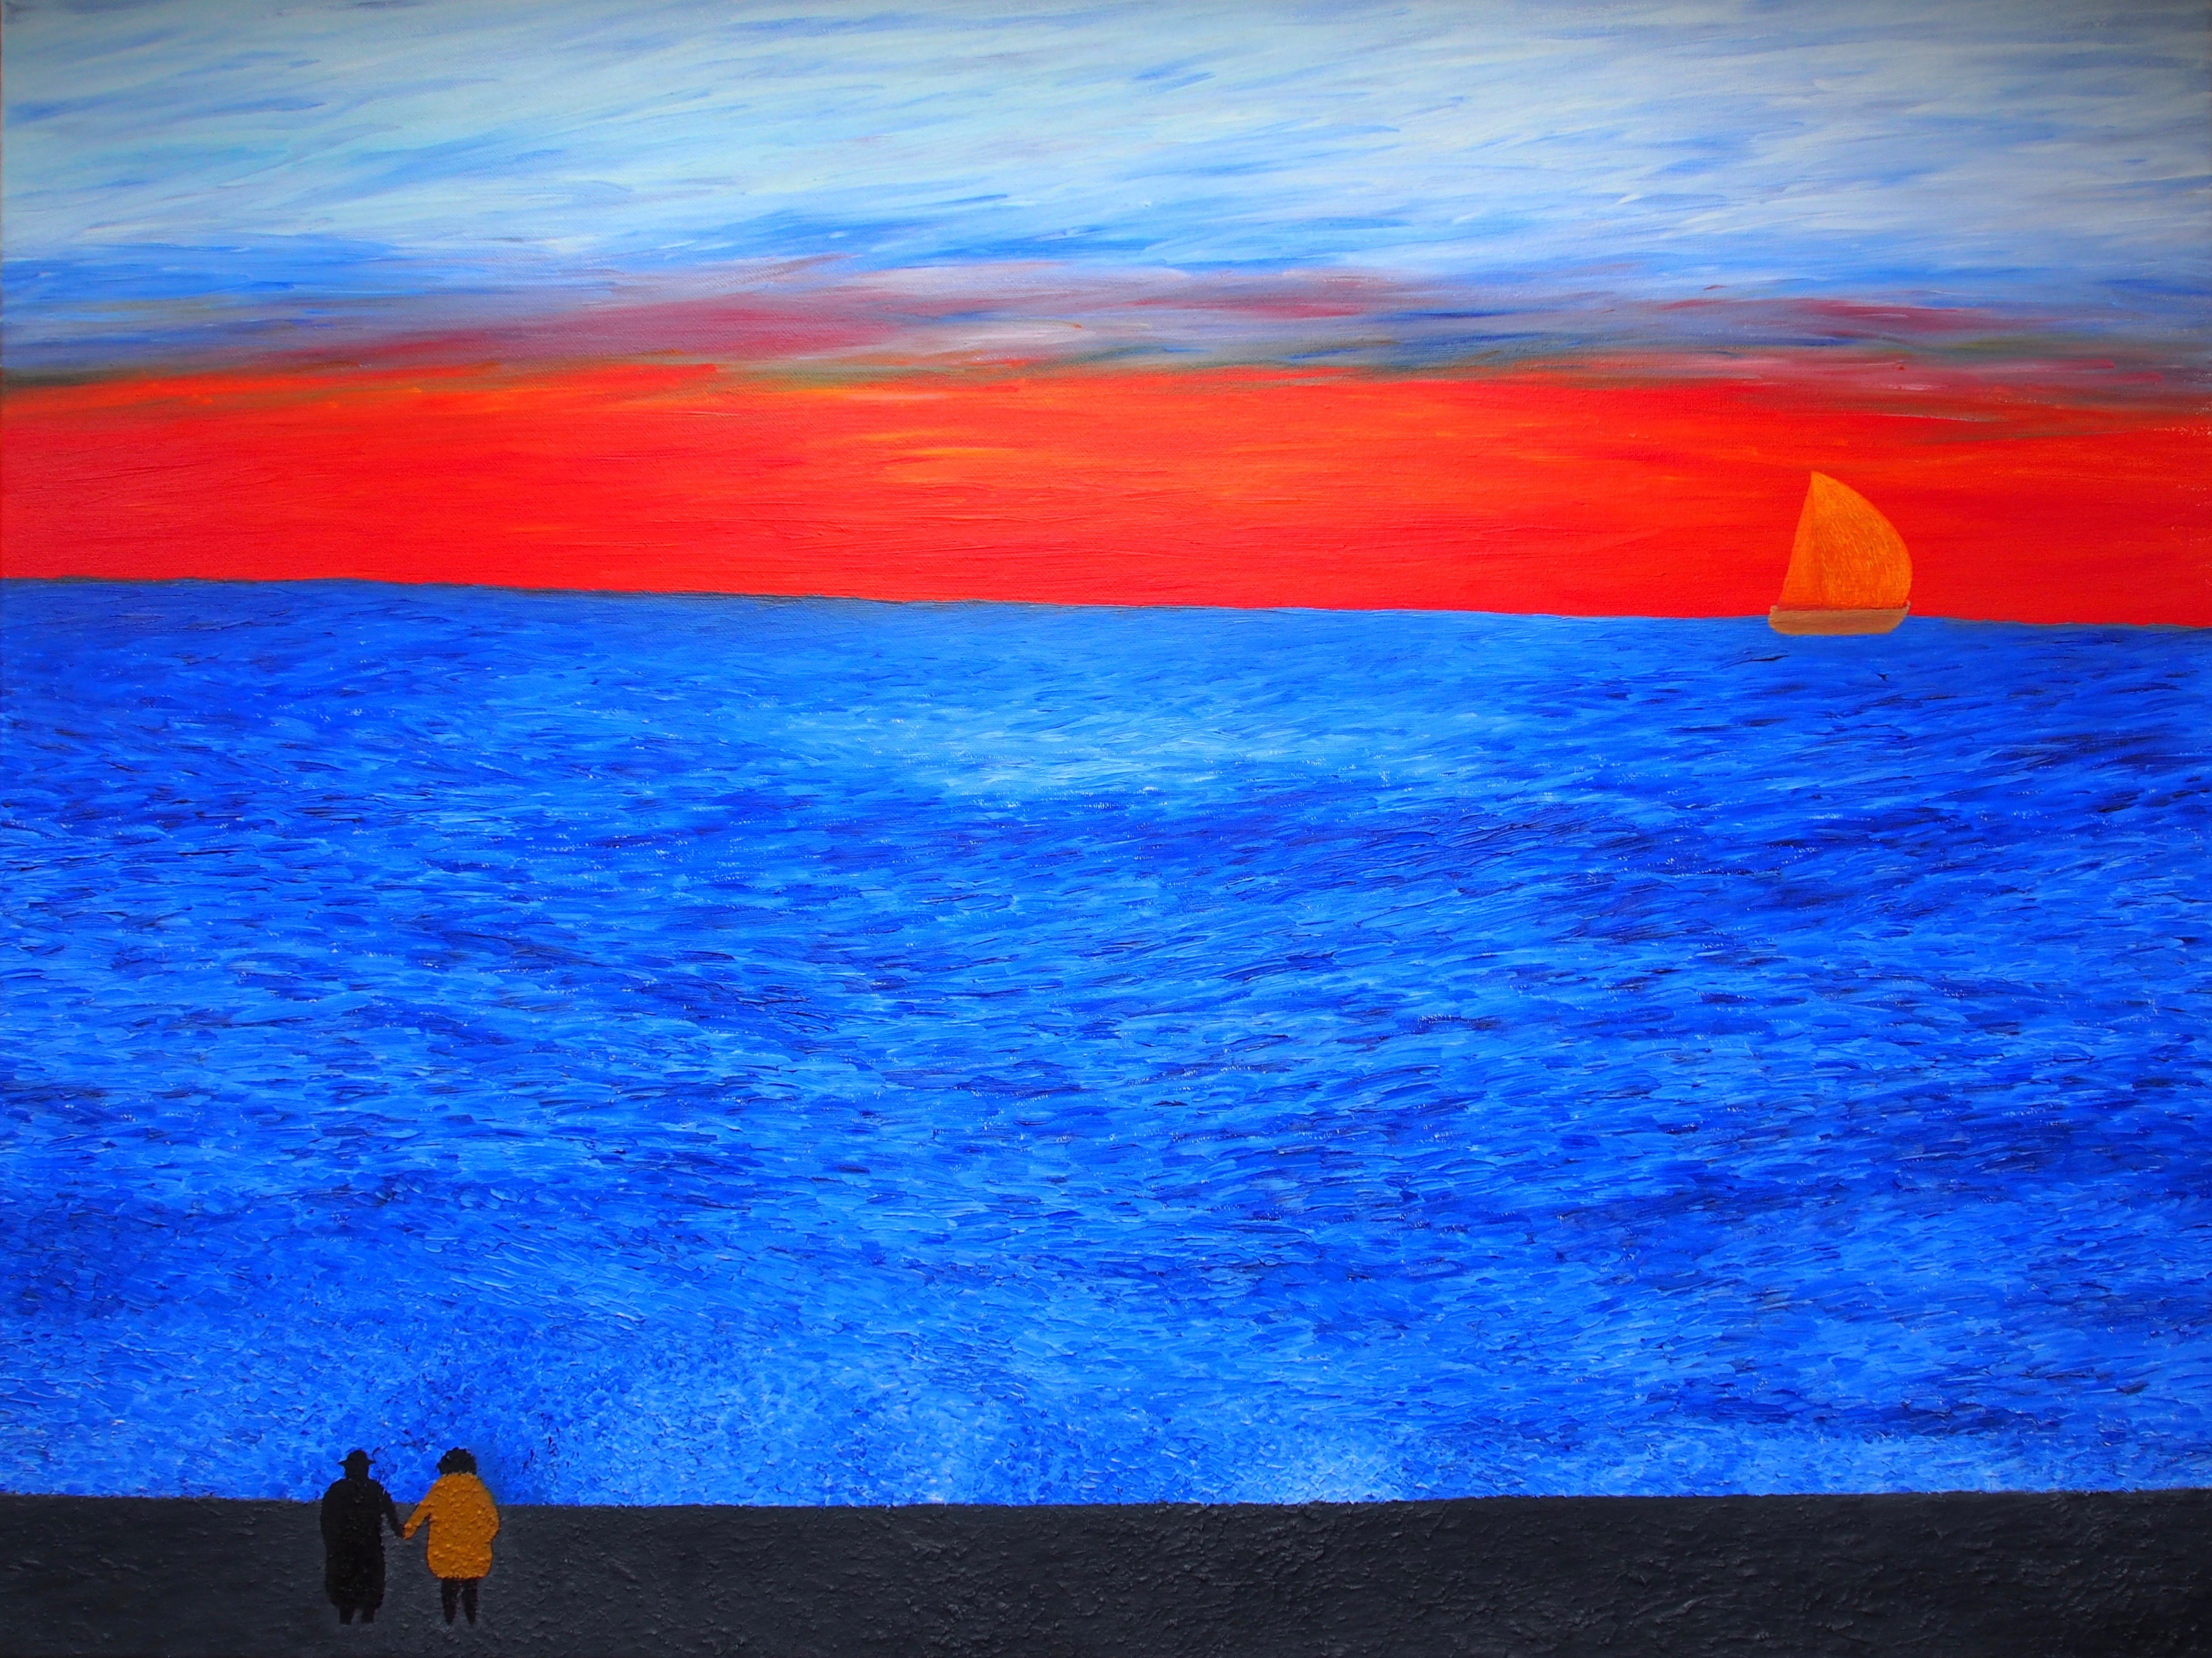 Taras-Koval-Illusion-752 Art